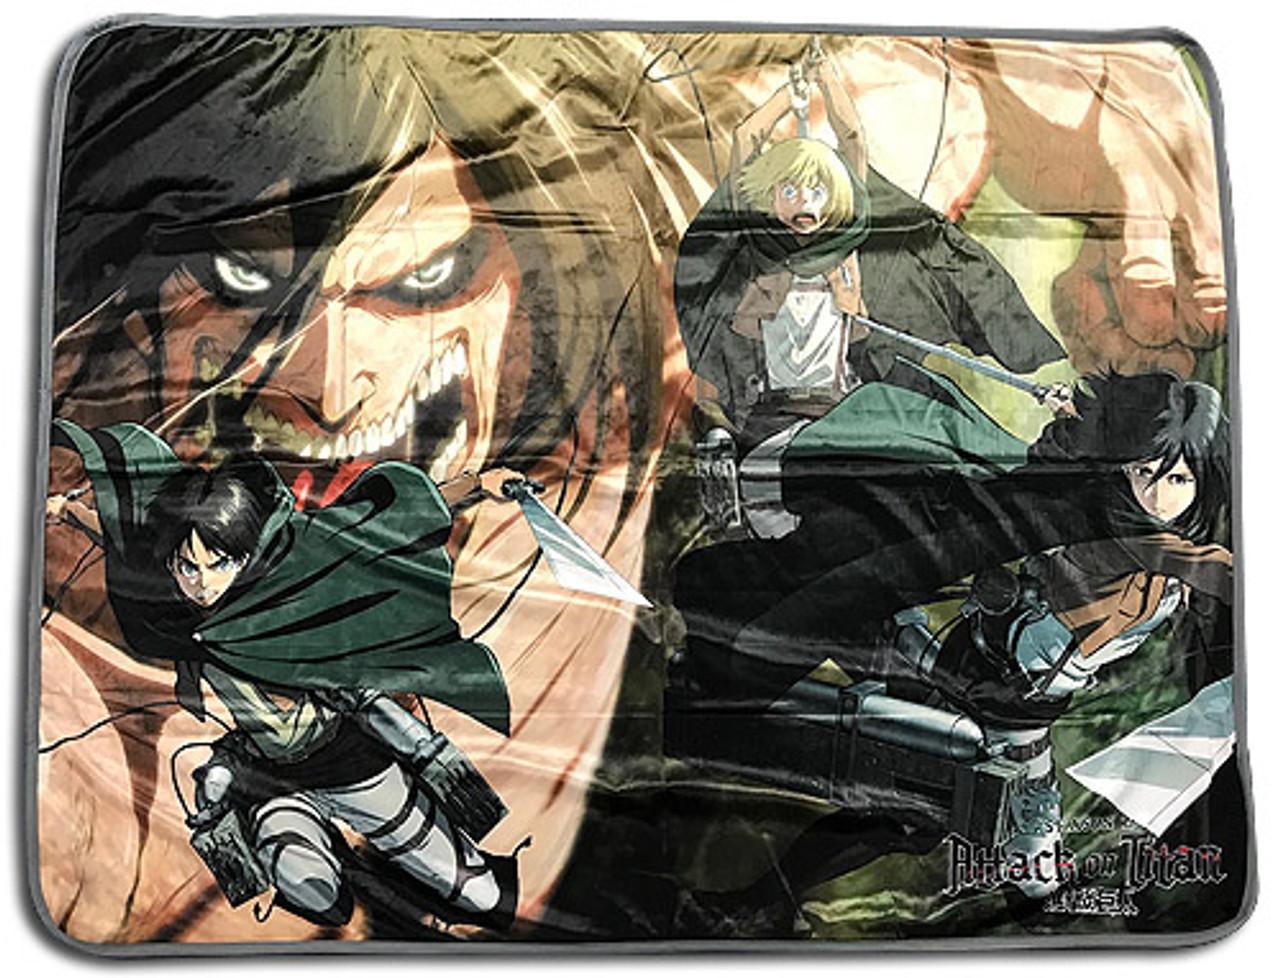 New Blue Sky Attack on Titan Battle Plush Throw Gift Blanket Eren Armin Mikasa